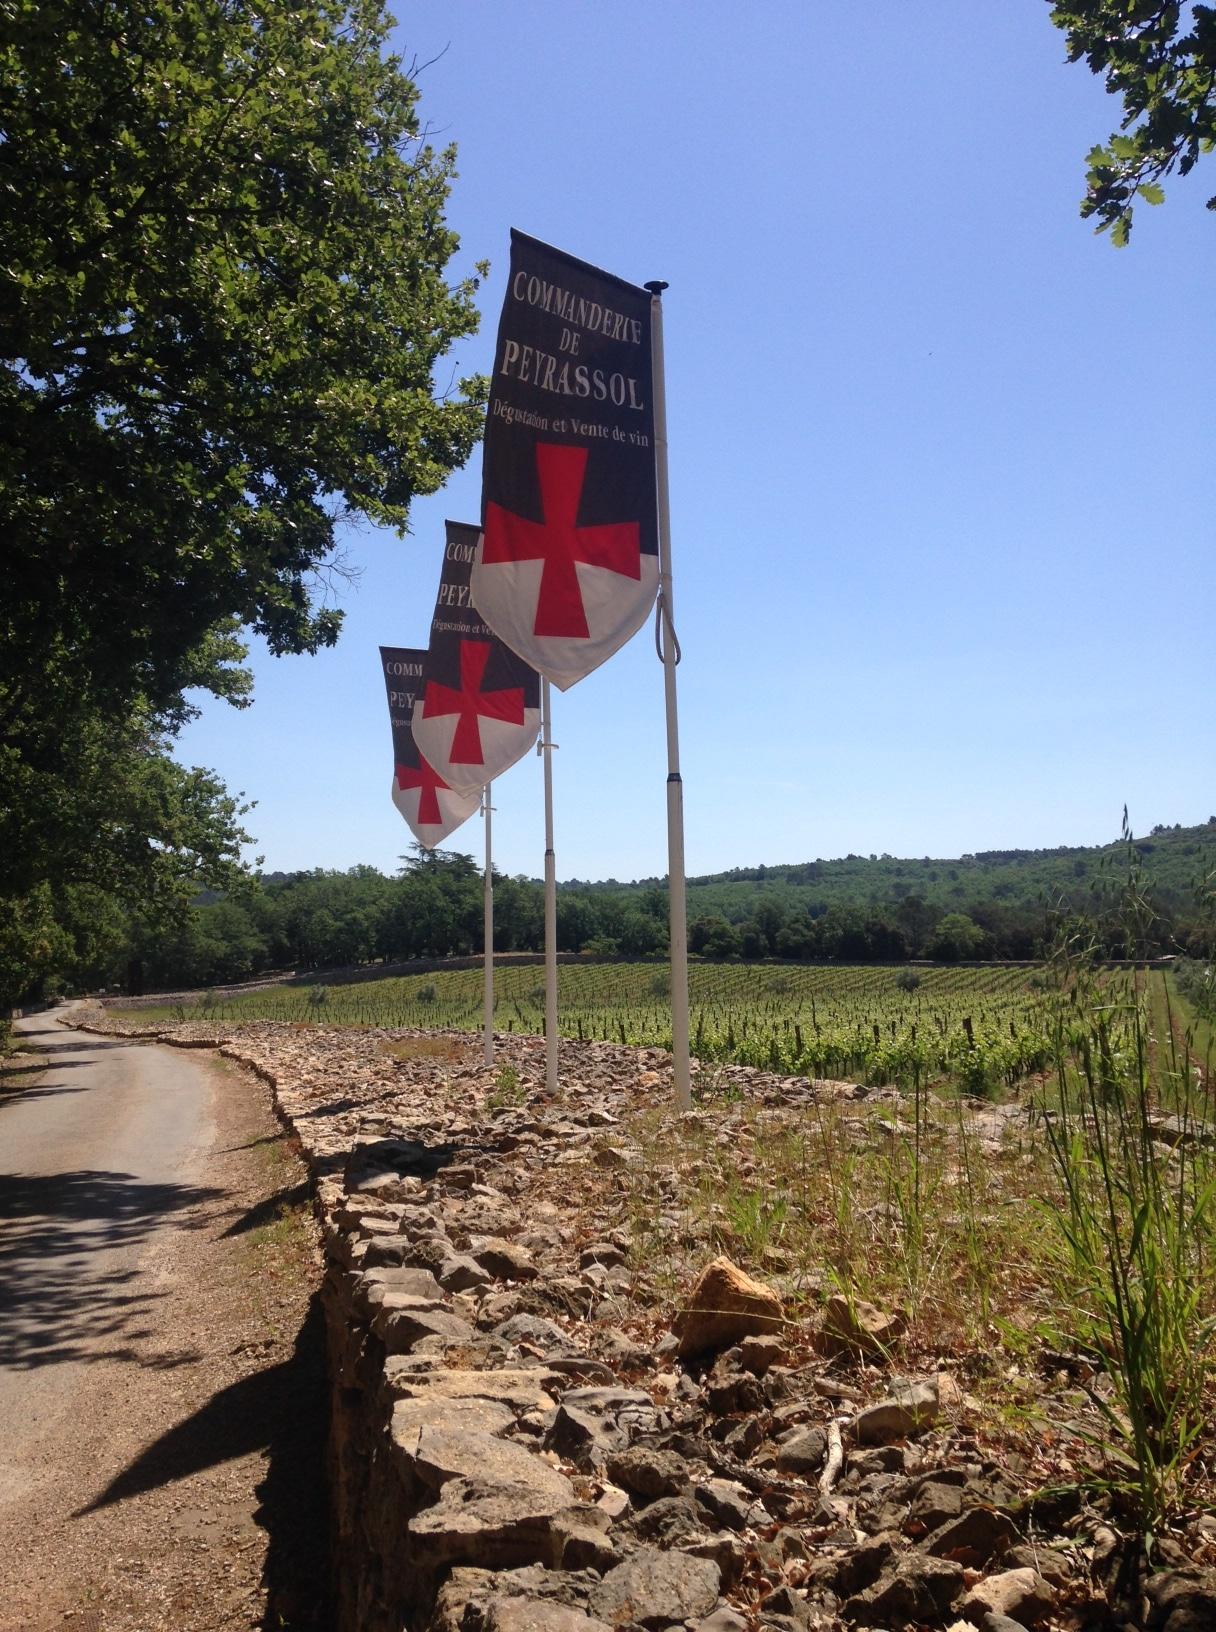 Provence wine tour, Commanderie de Peyrassol Draguignan